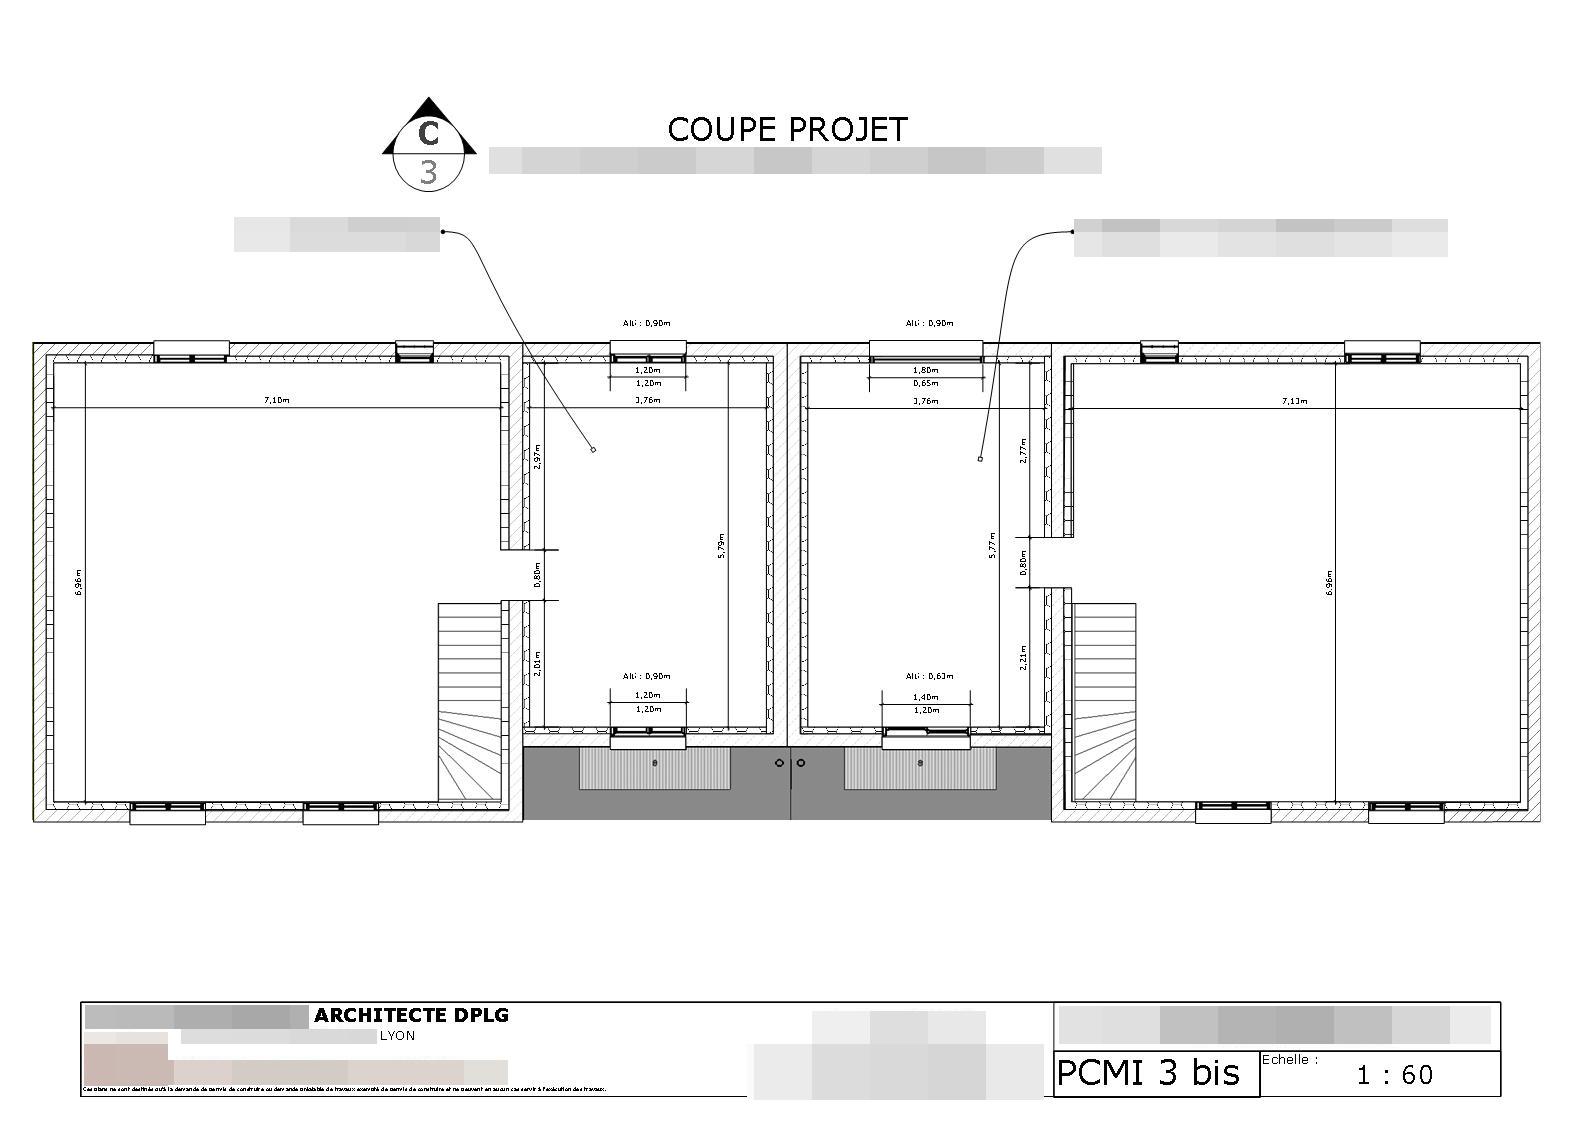 Permis de construire PCMI 3bis